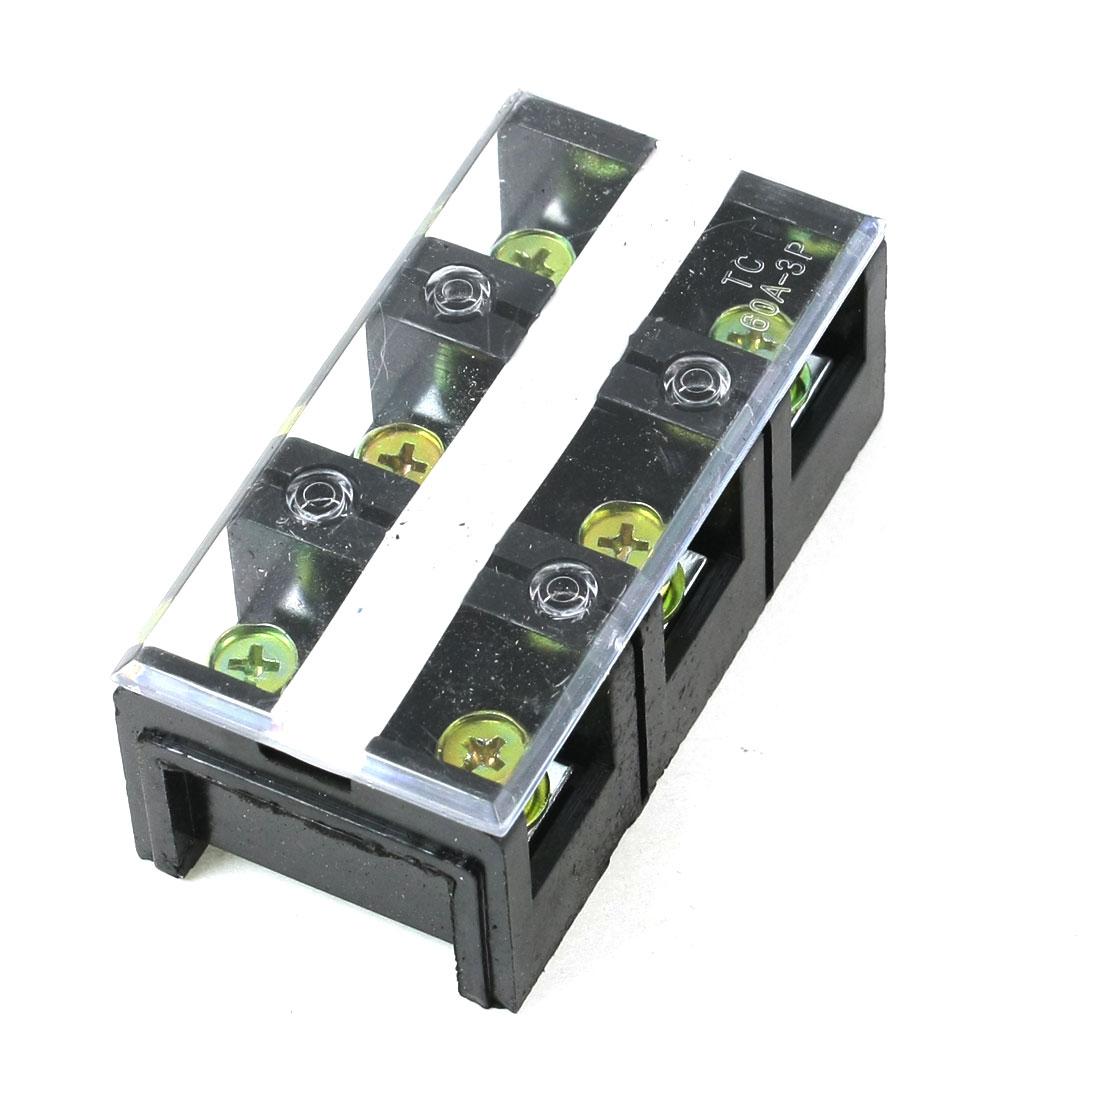 600V 60A Dual Row 3 Positions Barrier Screw Terminal Block TC-603